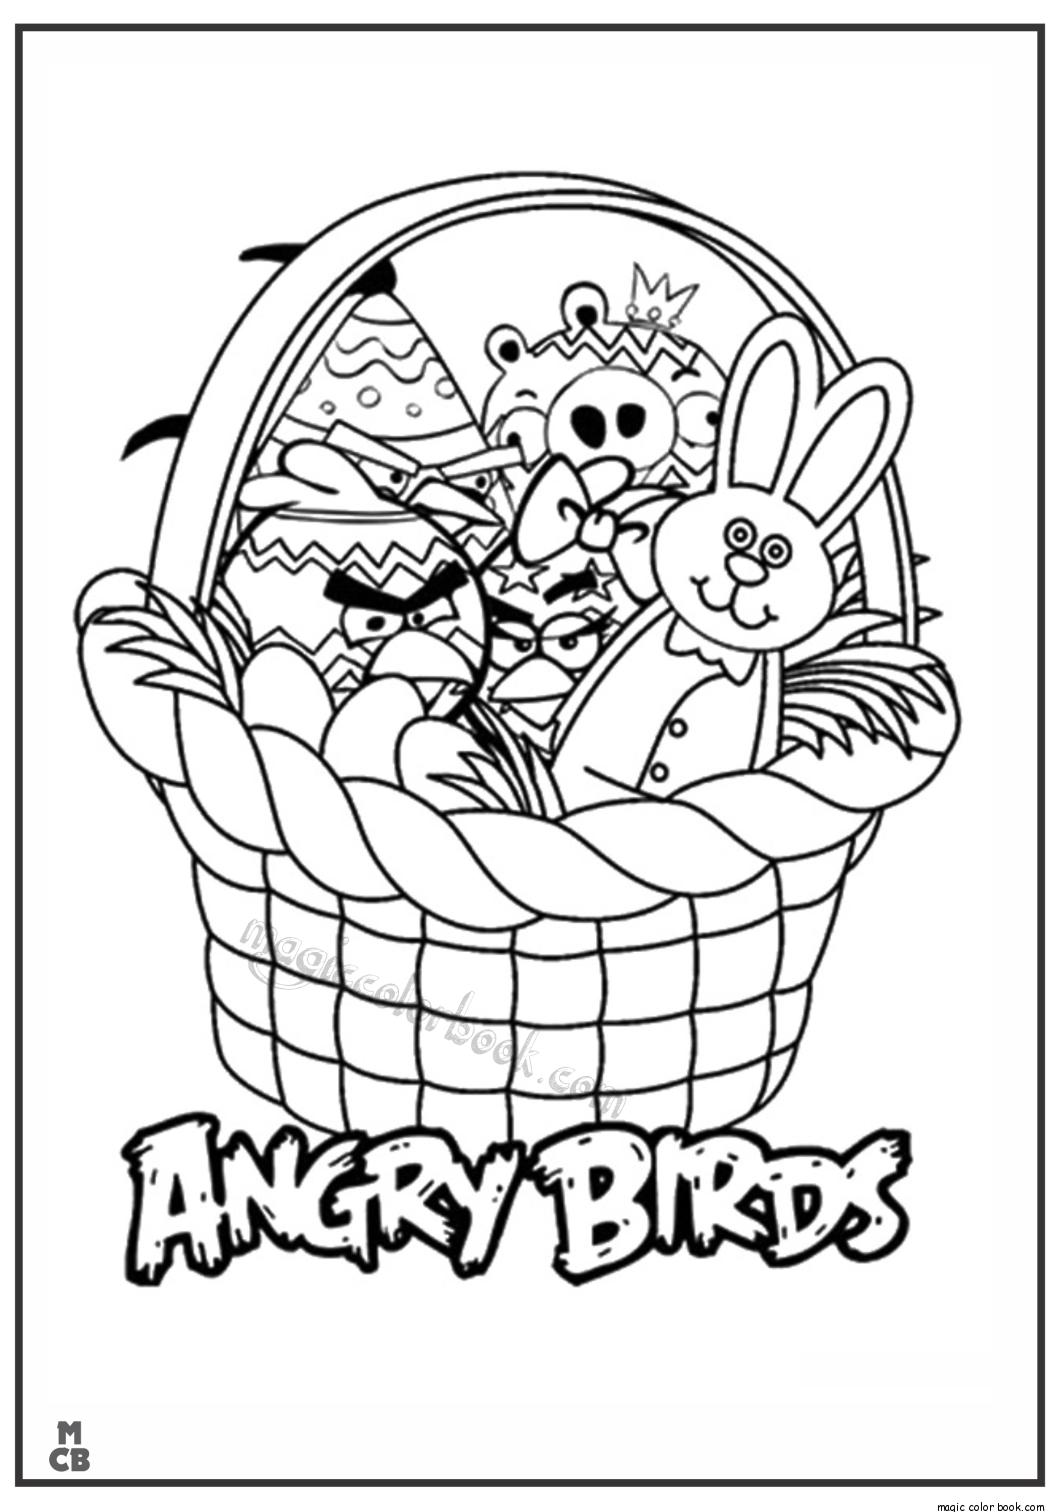 Pin de Magic Color Book en Angry Birds Coloring pages | Pinterest